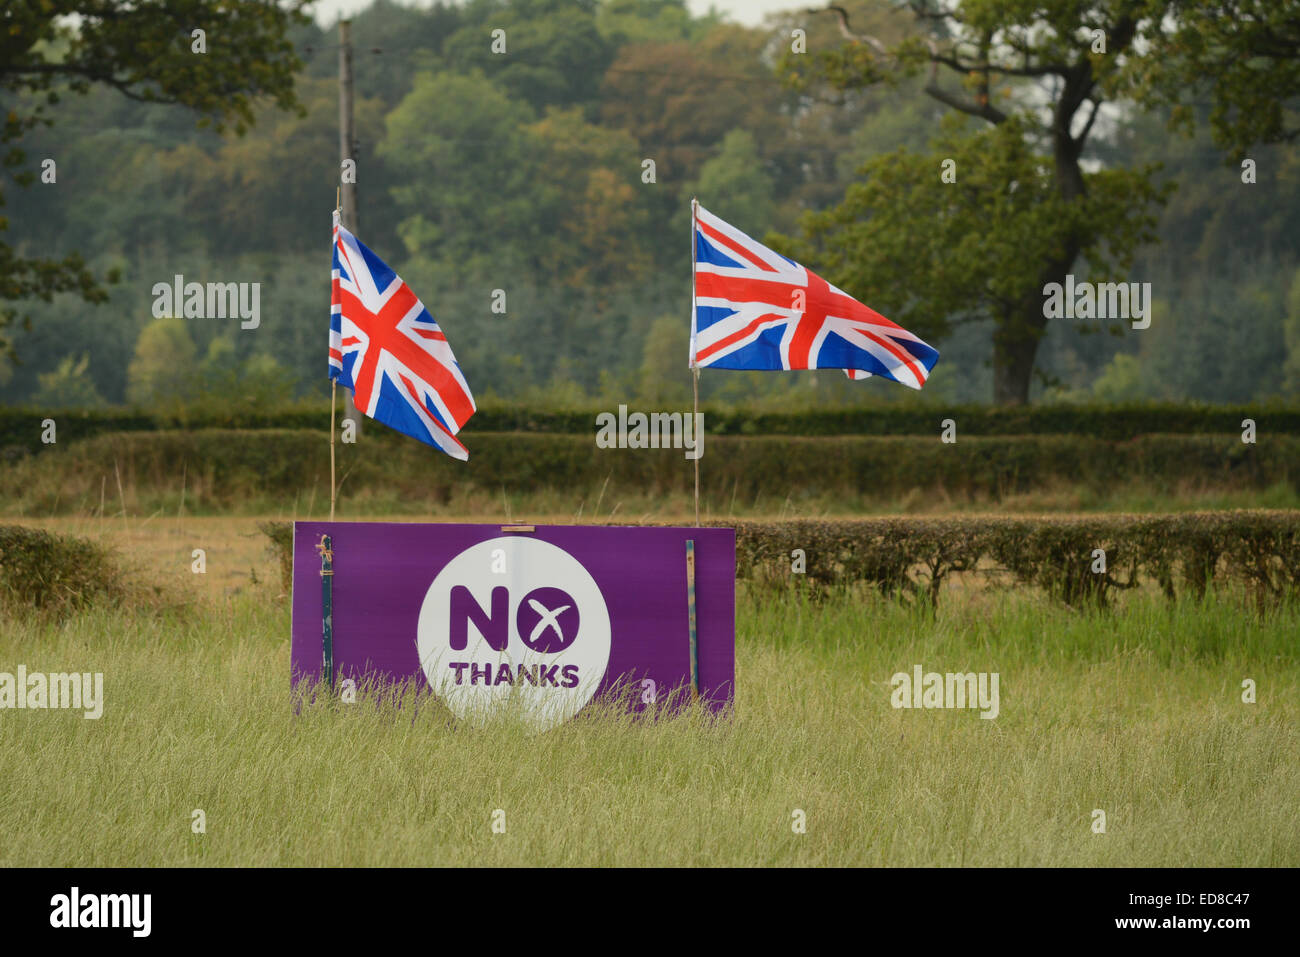 Scottish Independence -  Purple 'No Thanks' Scottish Independence Referendum sign decorated with Union Jack Flags Stock Photo